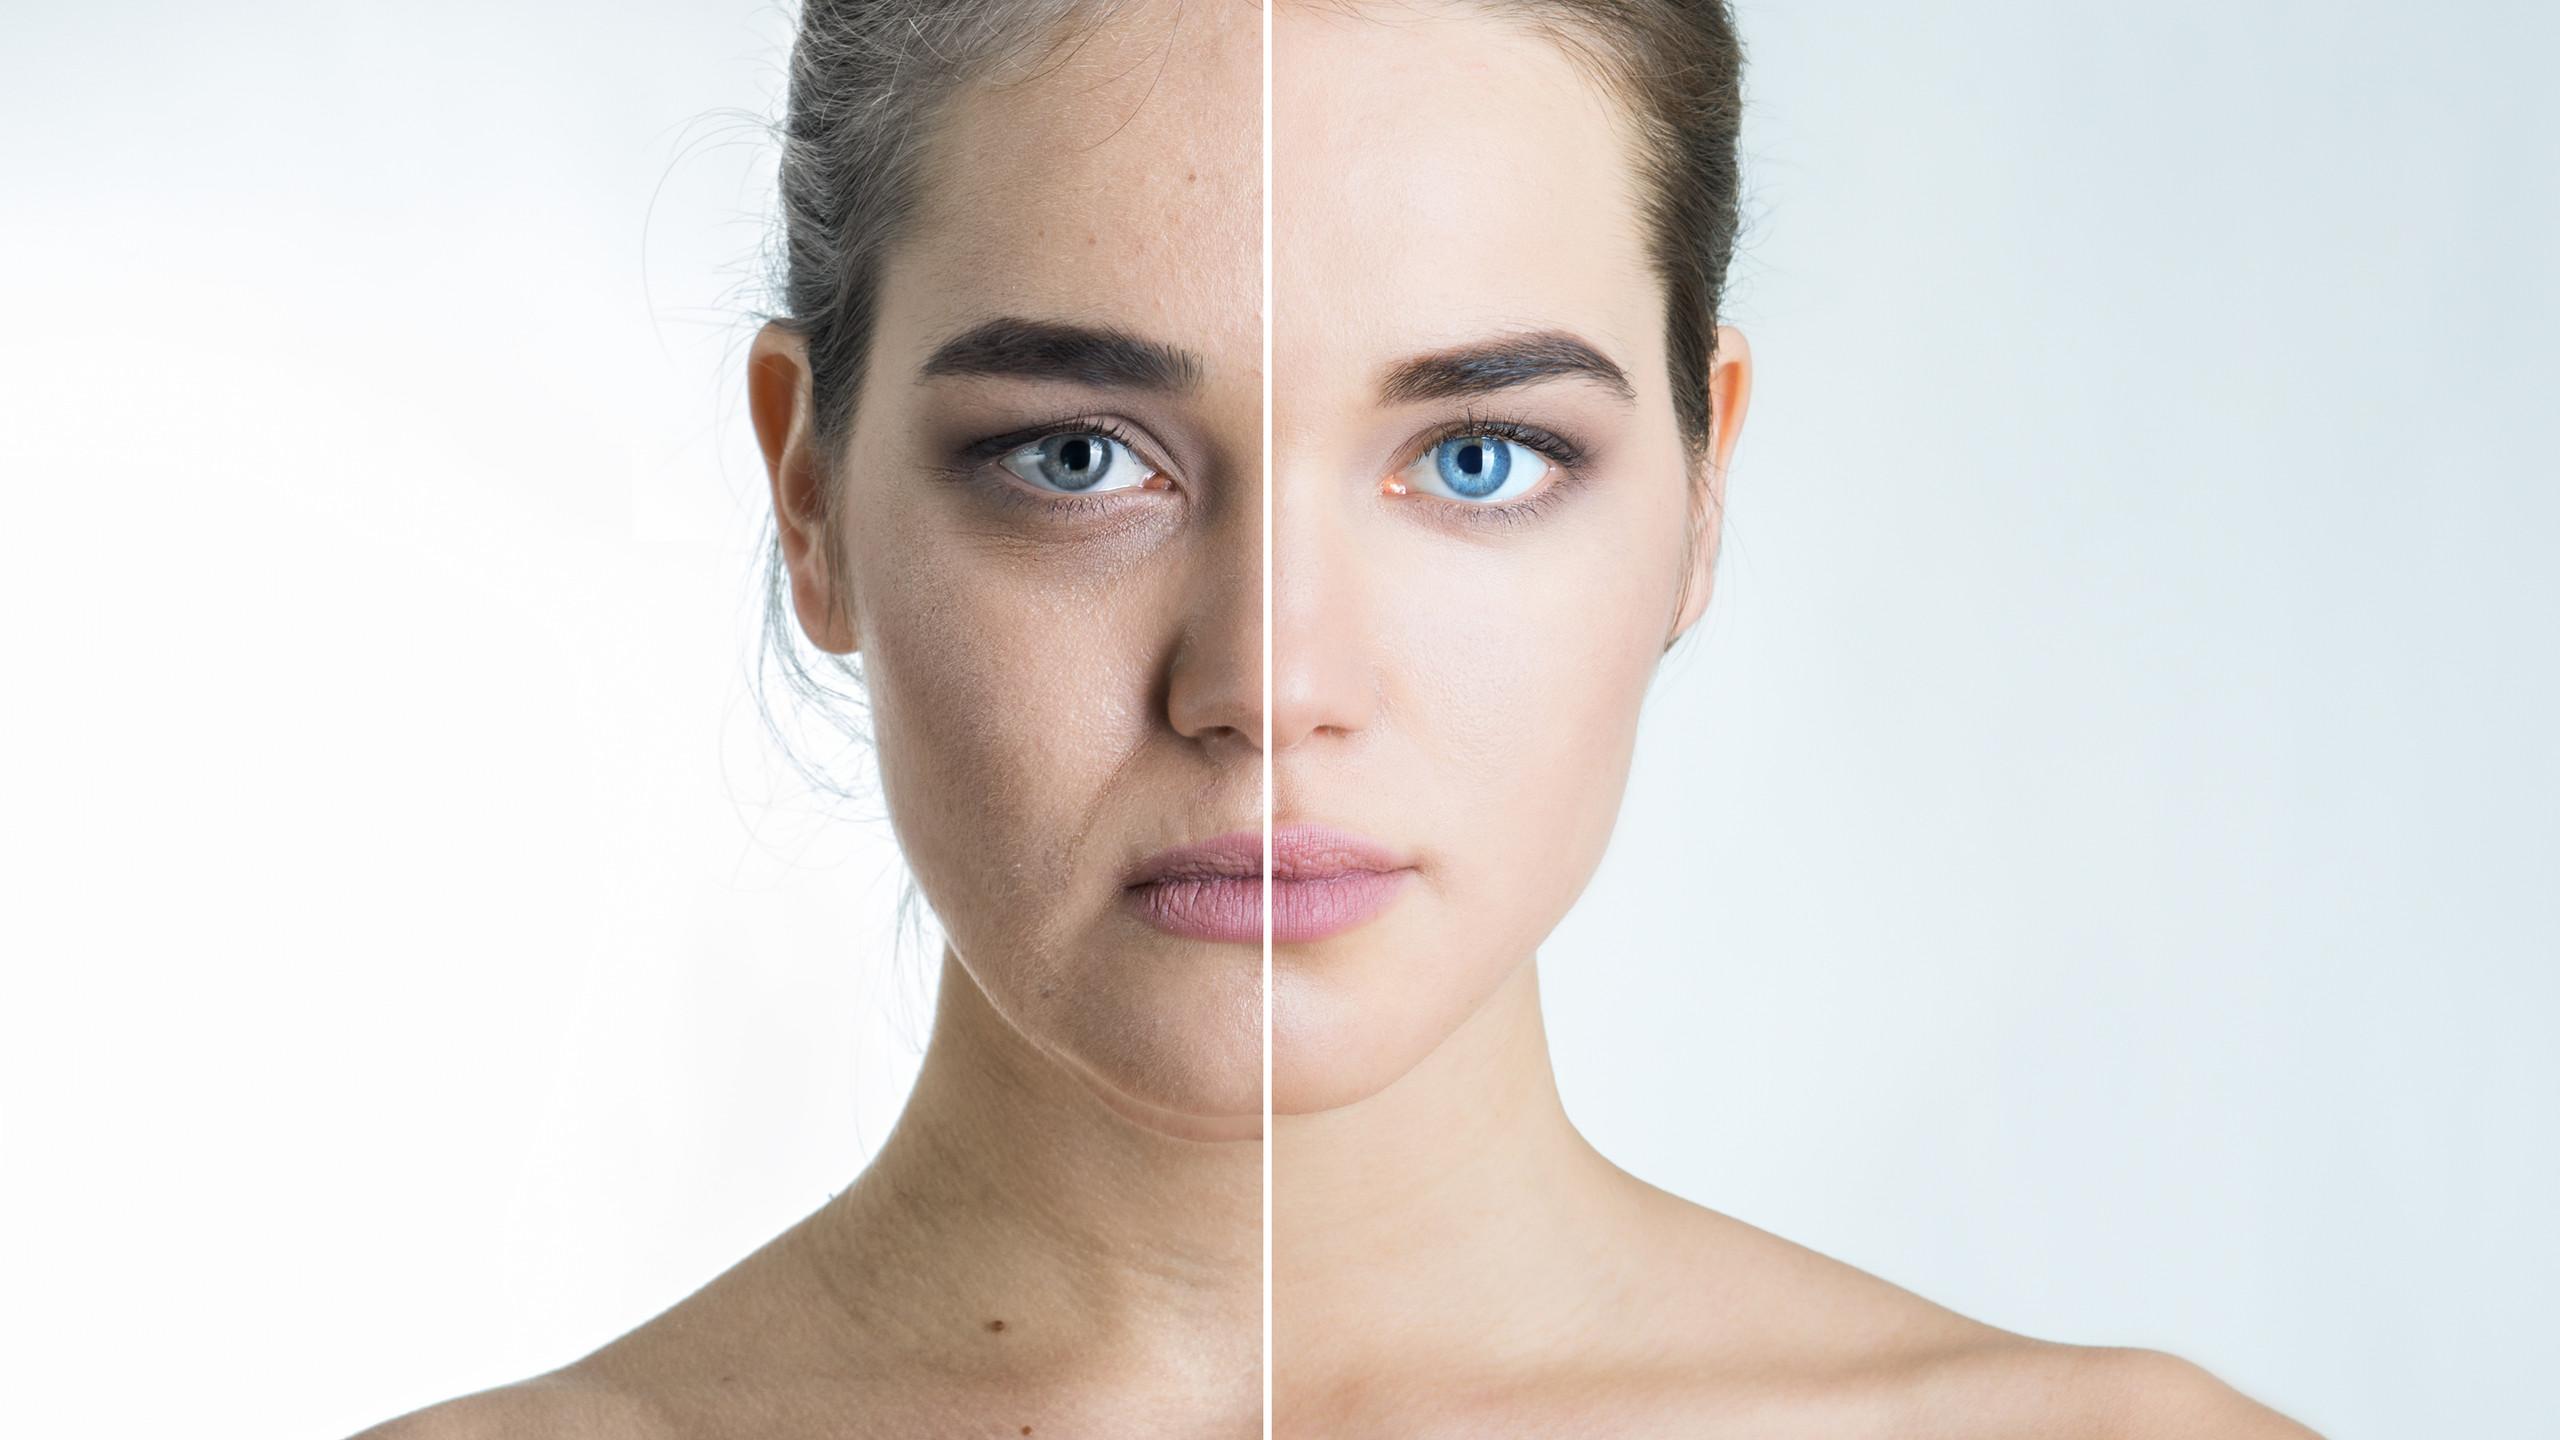 bigstock-Anti-aging-concept-beautiful--210457609